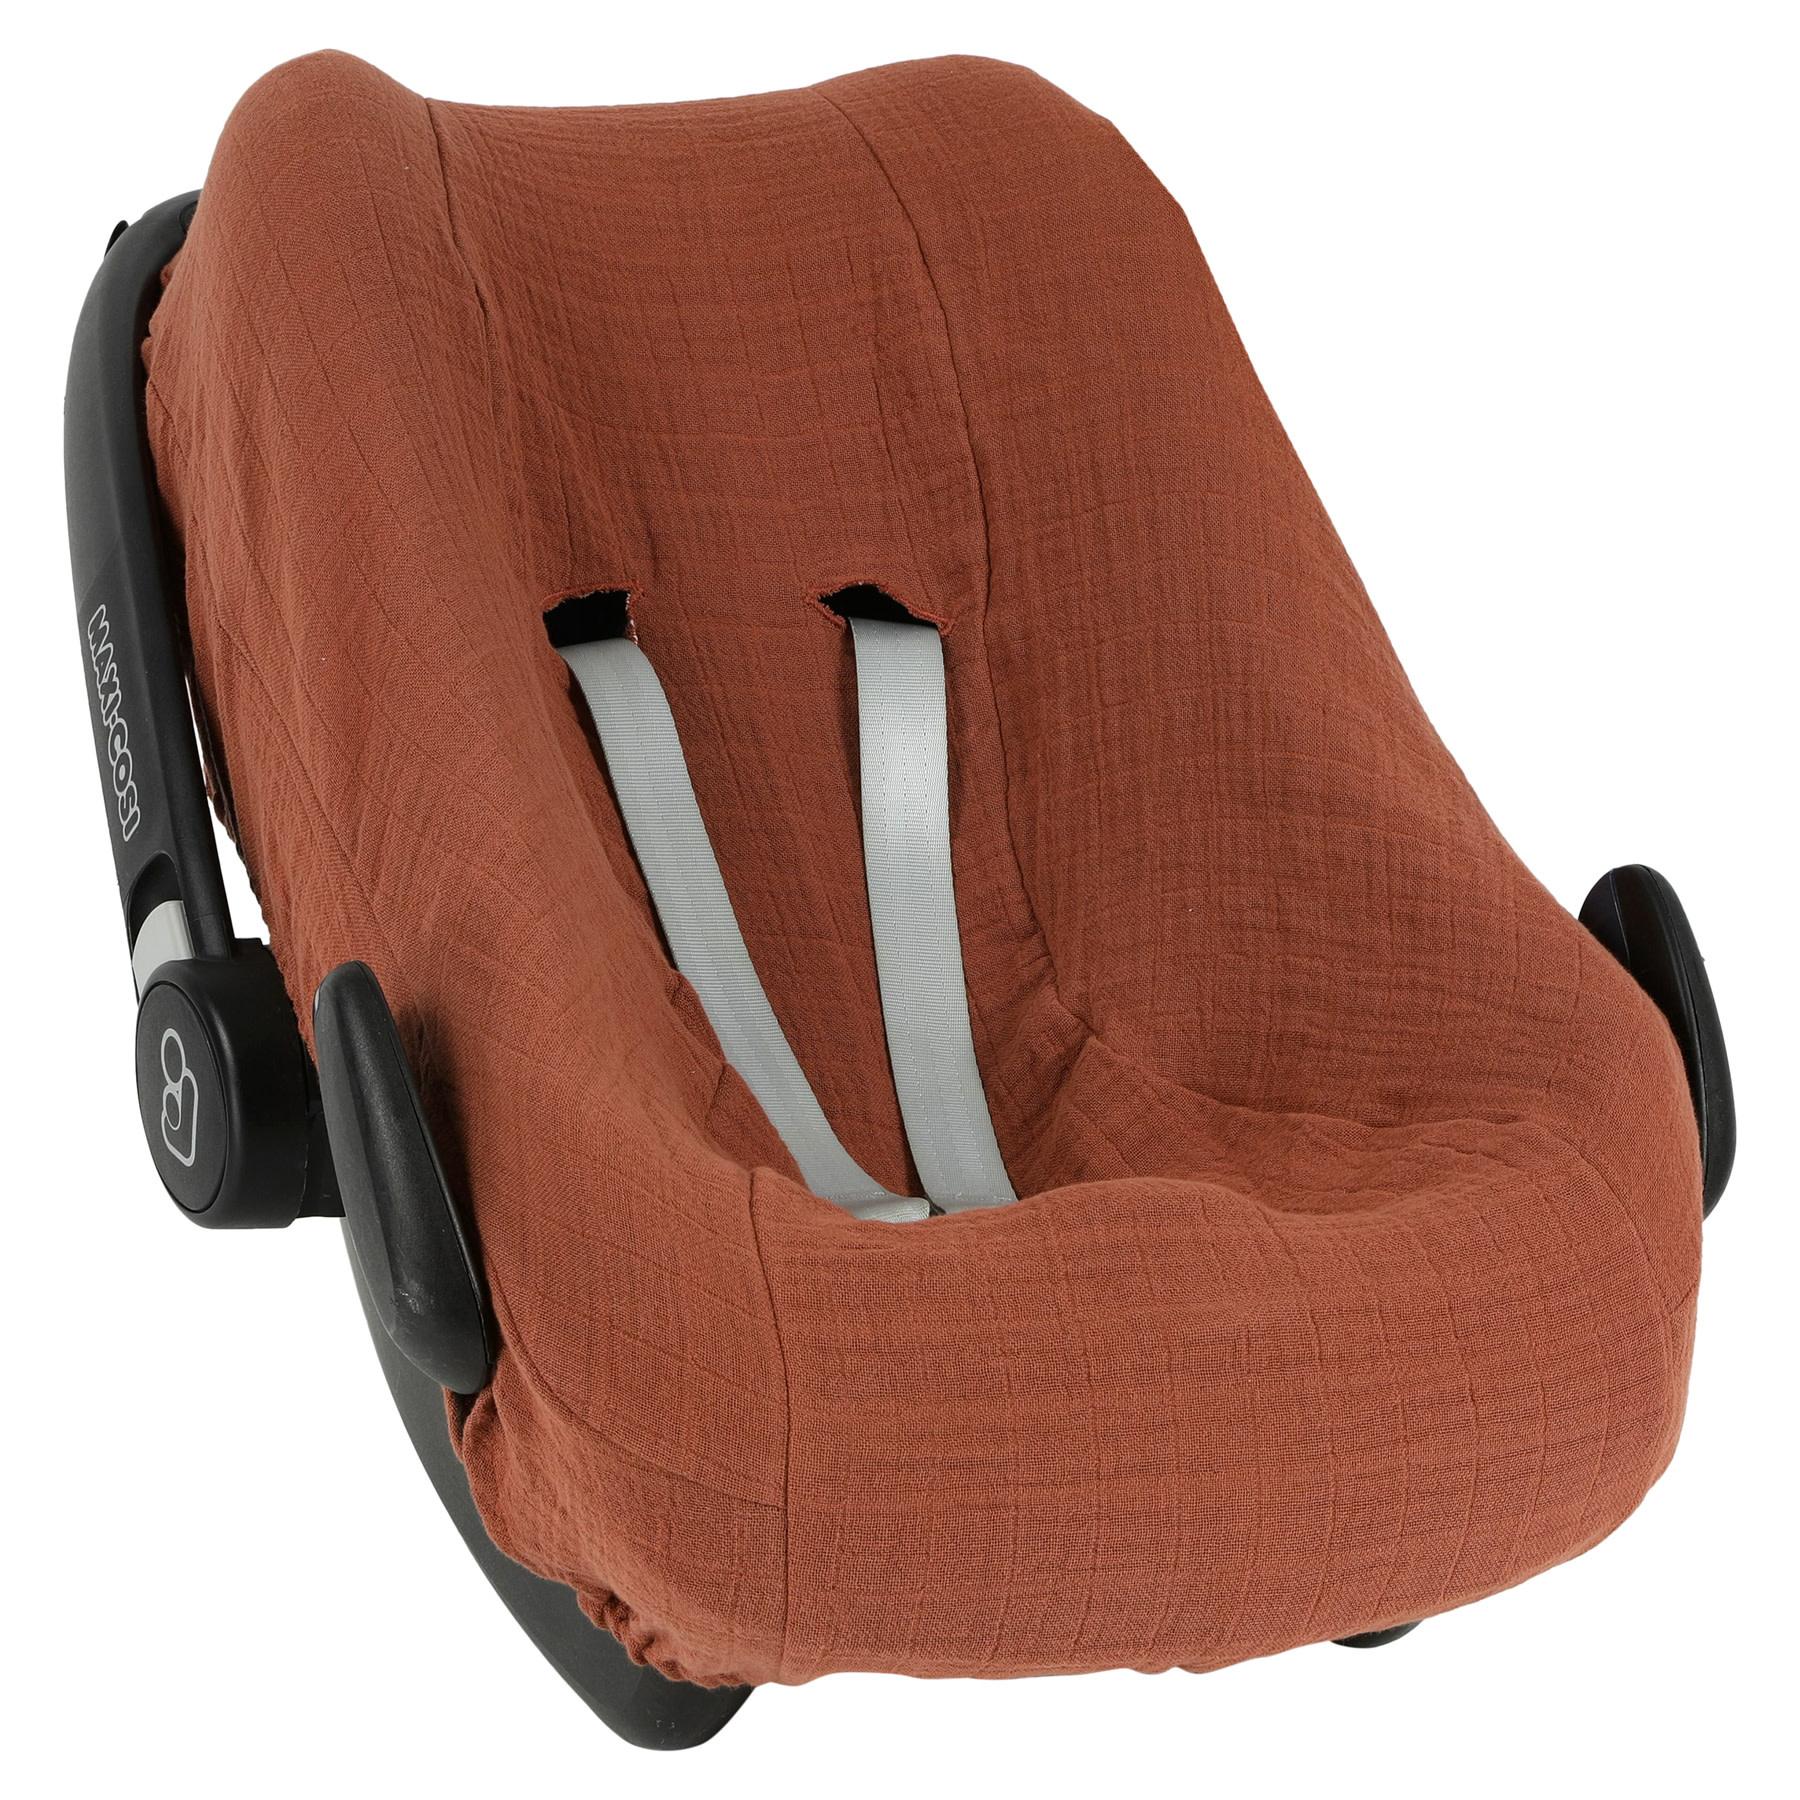 Hoes autostoel MC Pebble / Rock bliss rust-1